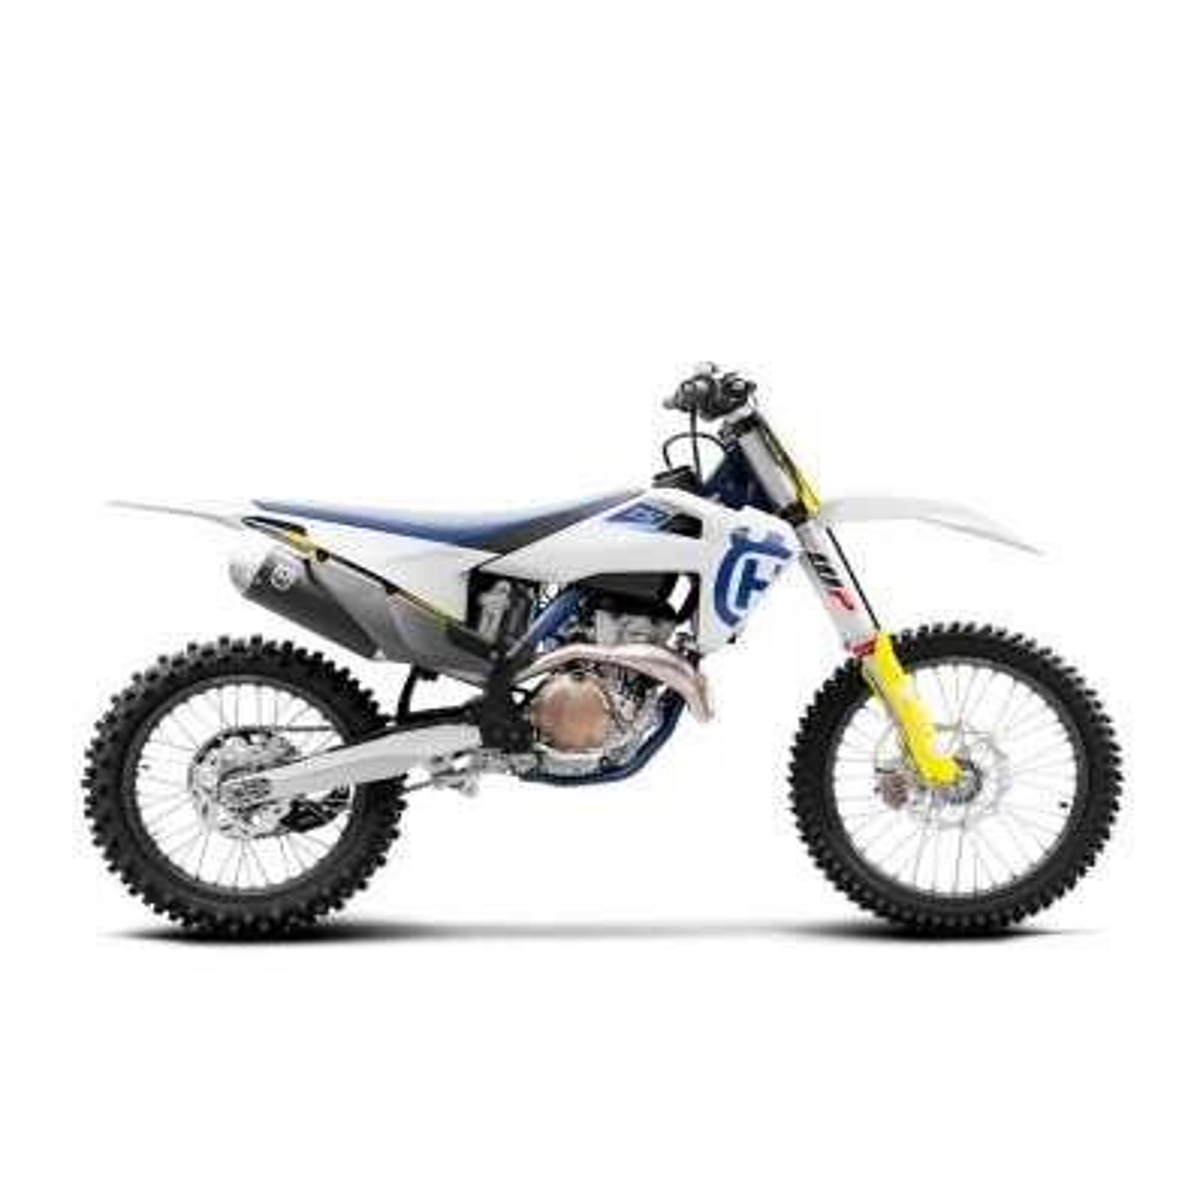 hsqv016 - Husqvarna Fc 350 2020